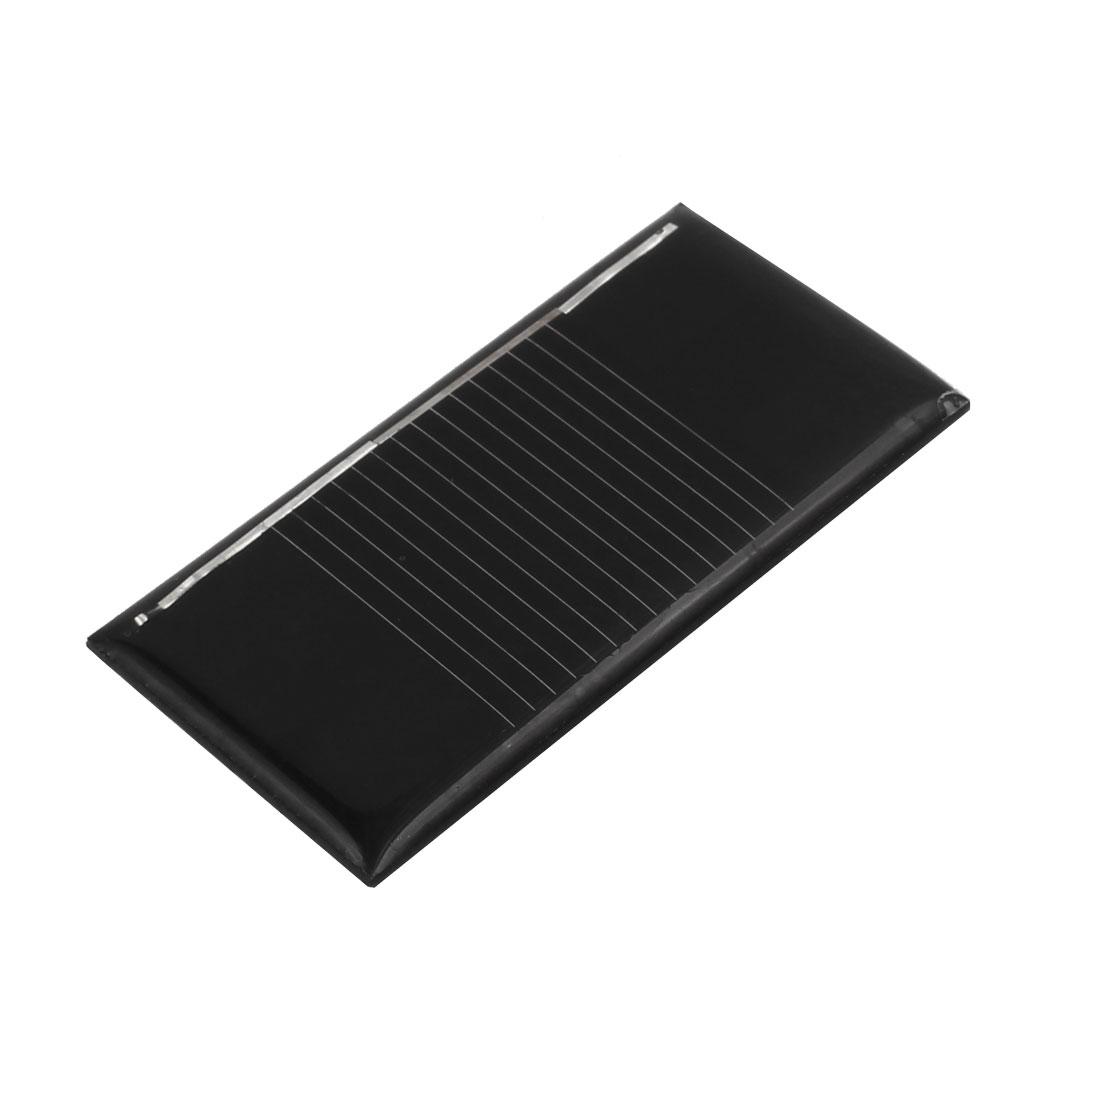 60mm x 30mm 0.14 Watts 0.5 Volts Polycrystalline Solar Cell Panel Module